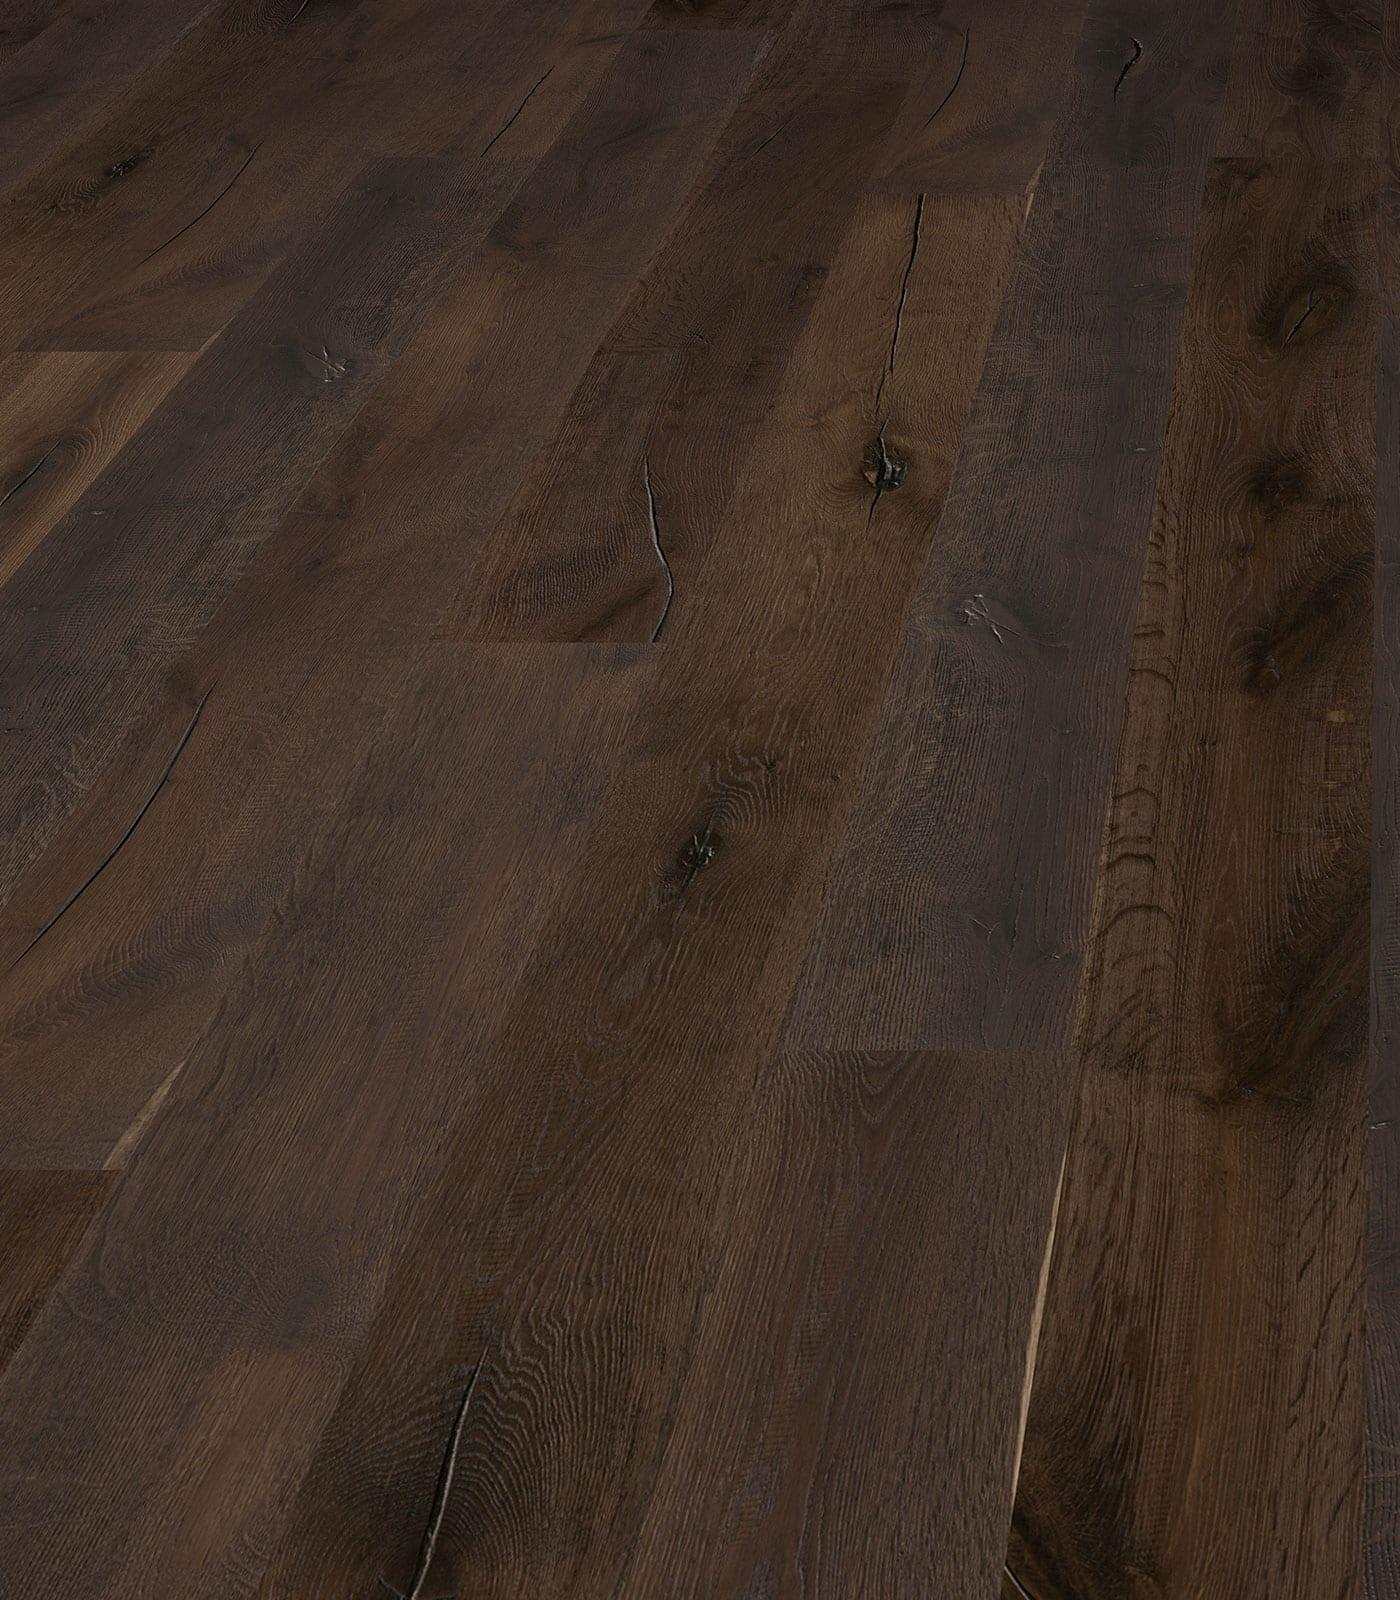 Atlay-Antique Collection-European Oak Floors-angle